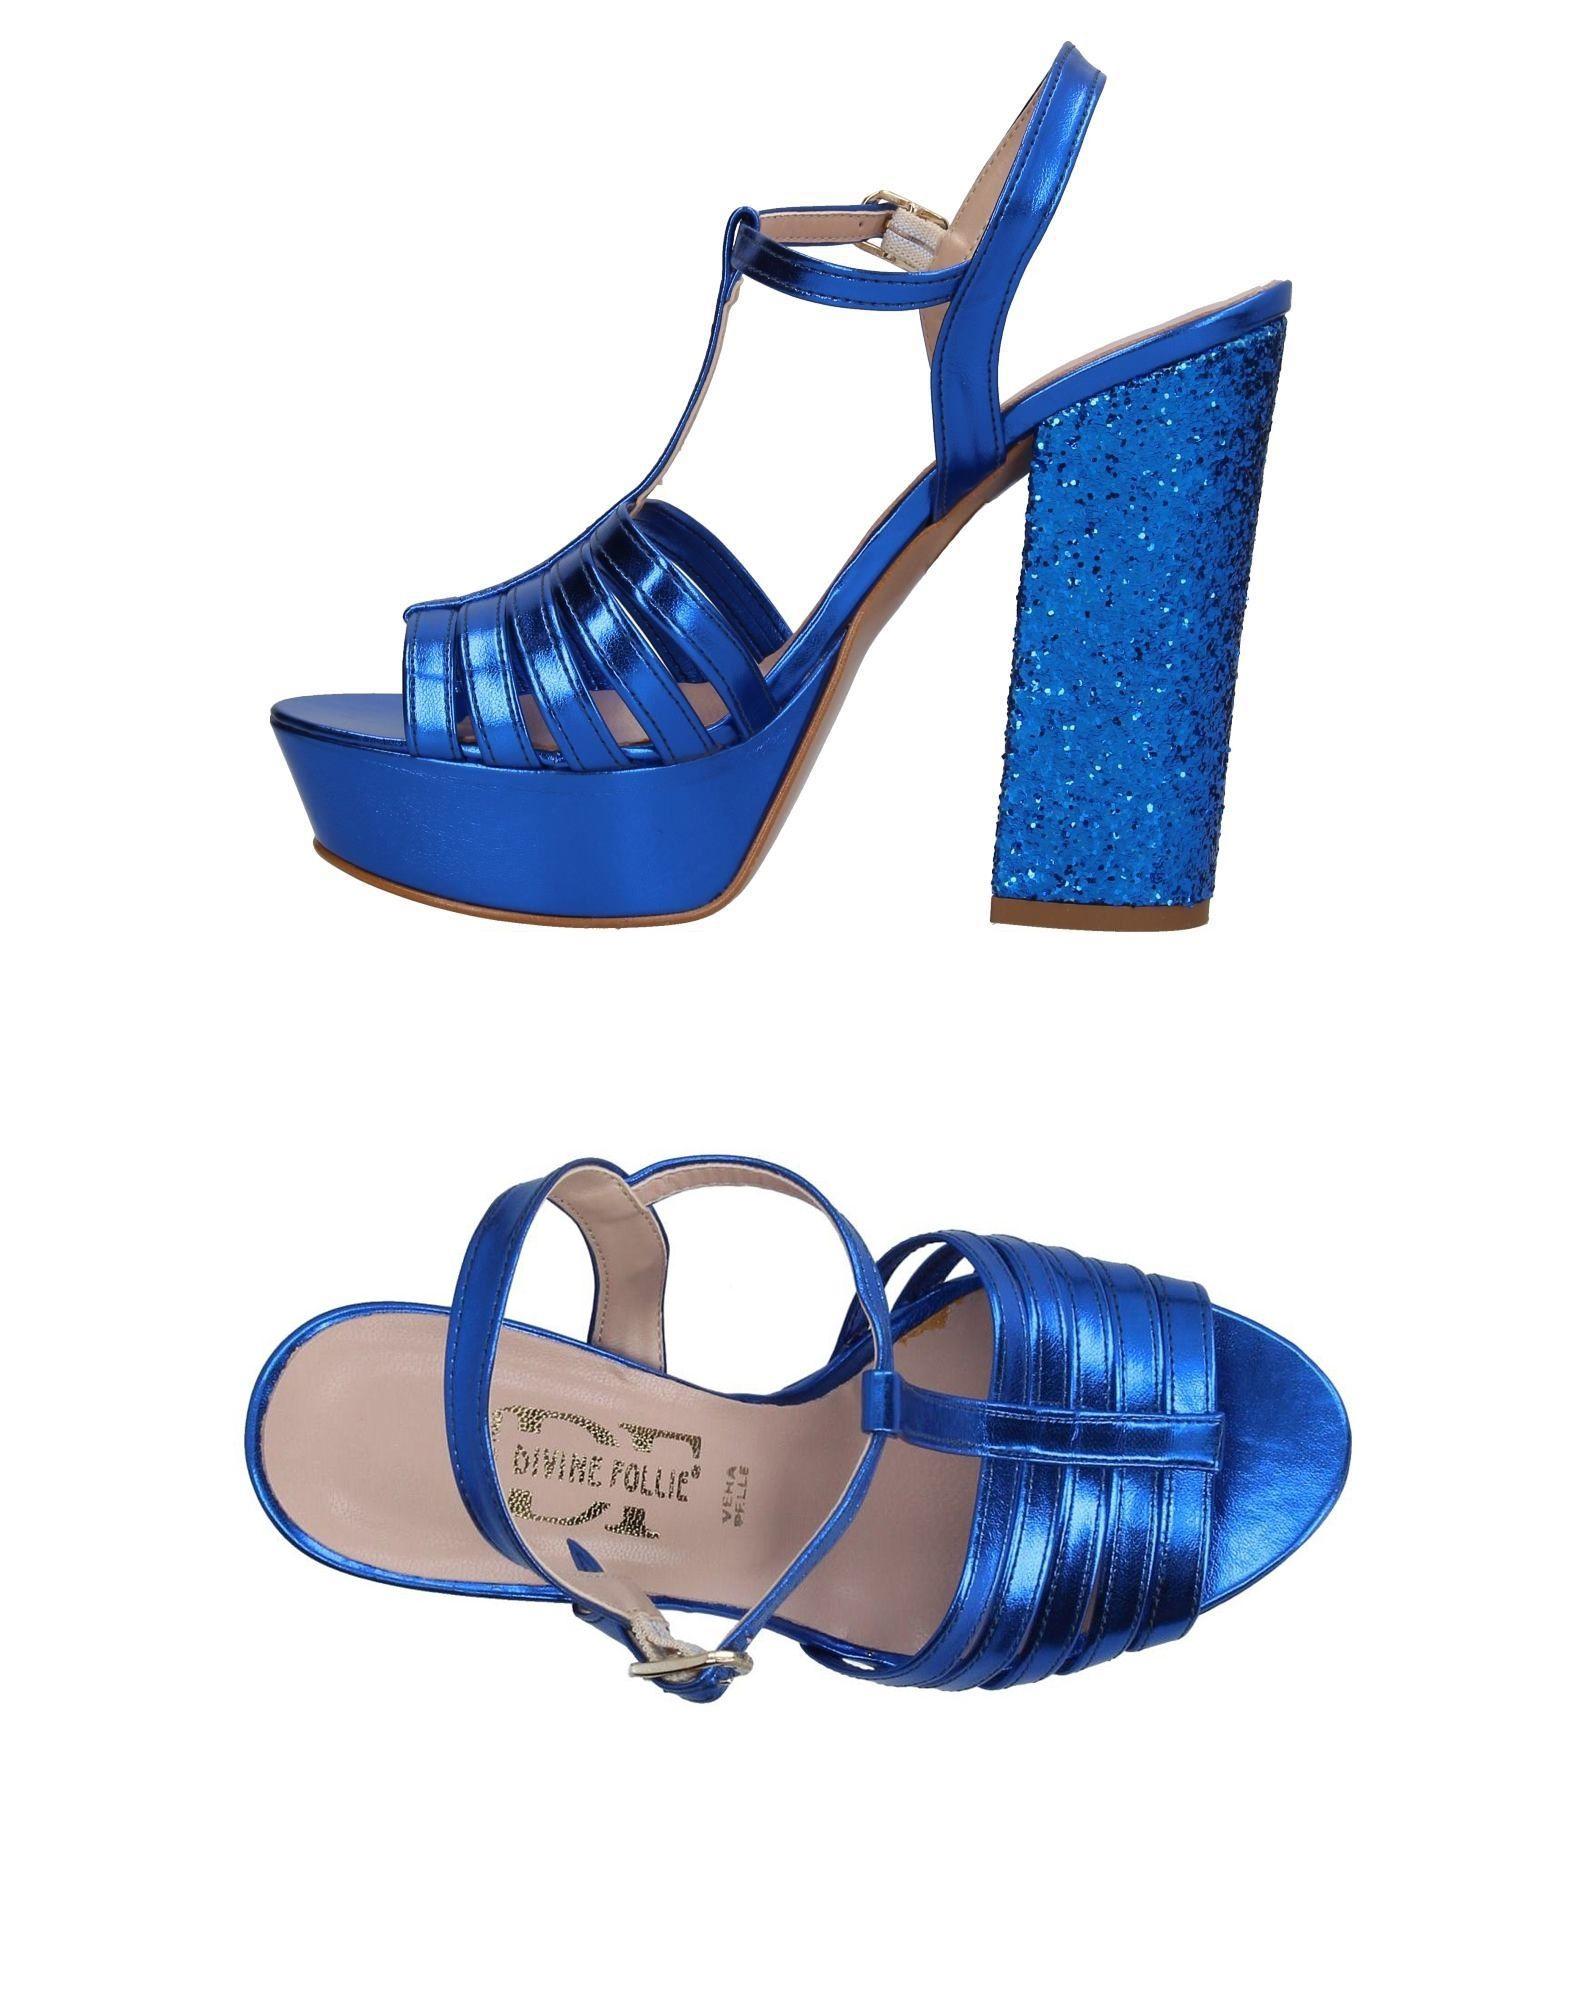 Divine Follie Gute Sandalen Damen 11375146KL Gute Follie Qualität beliebte Schuhe 213c39